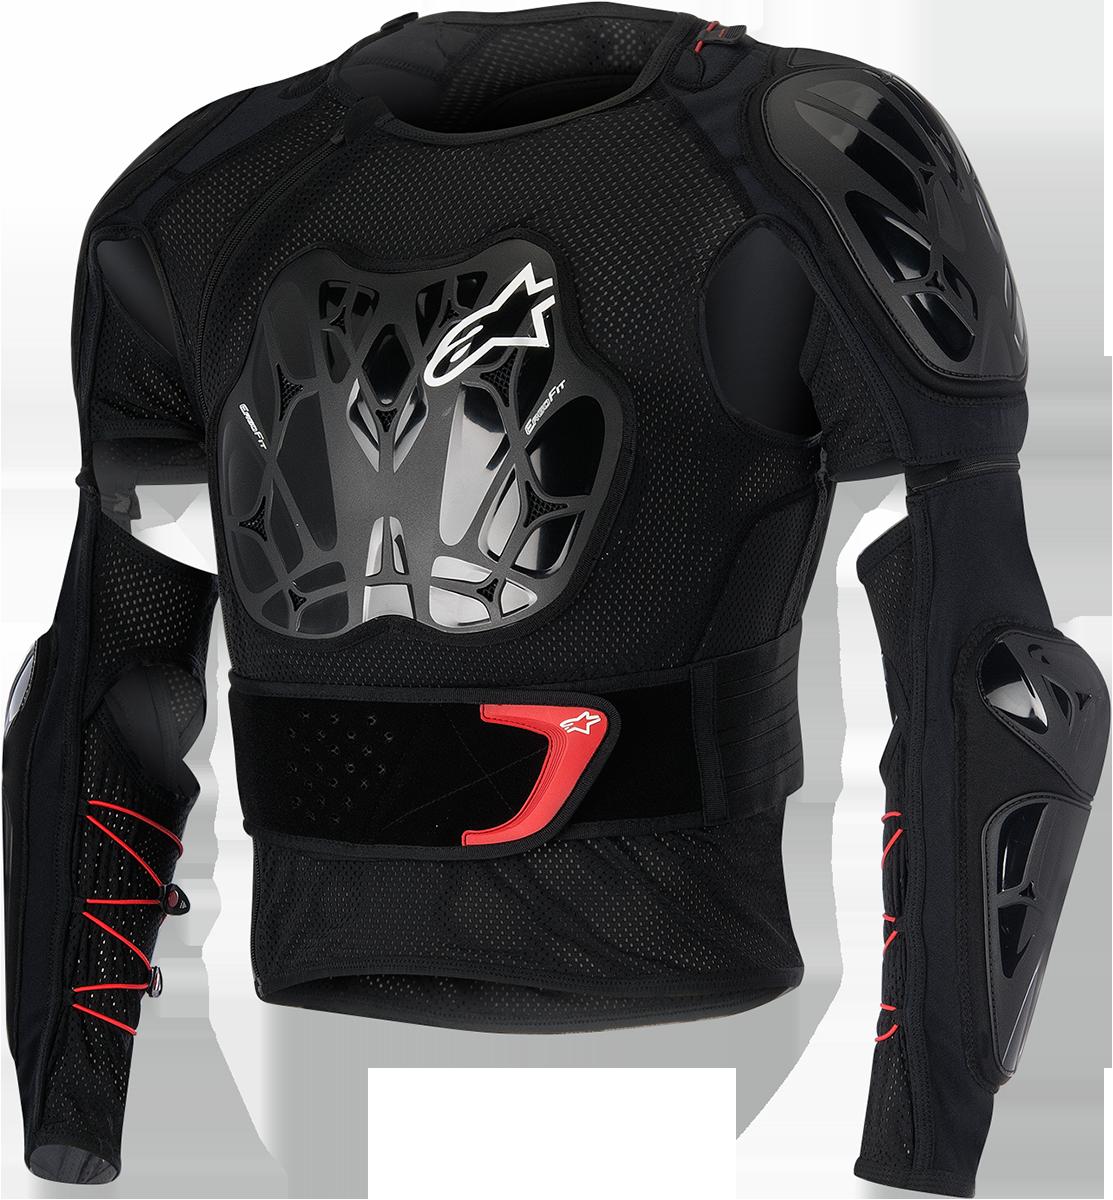 Alpinestars Black Unisex Textile Bionic Tech Off road Dirt Bike Racing Jacket